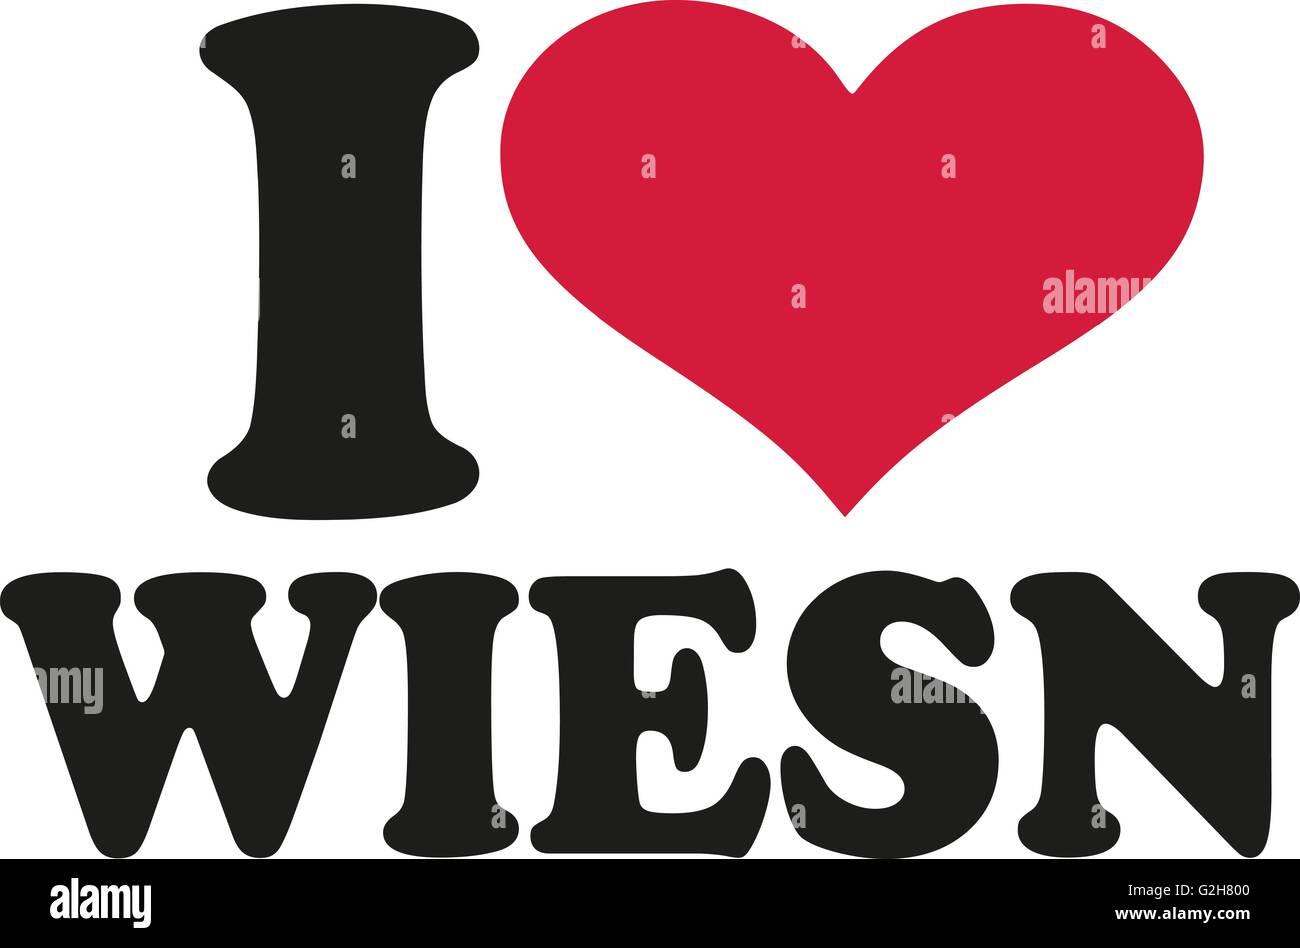 I heart wiesn - Stock Image